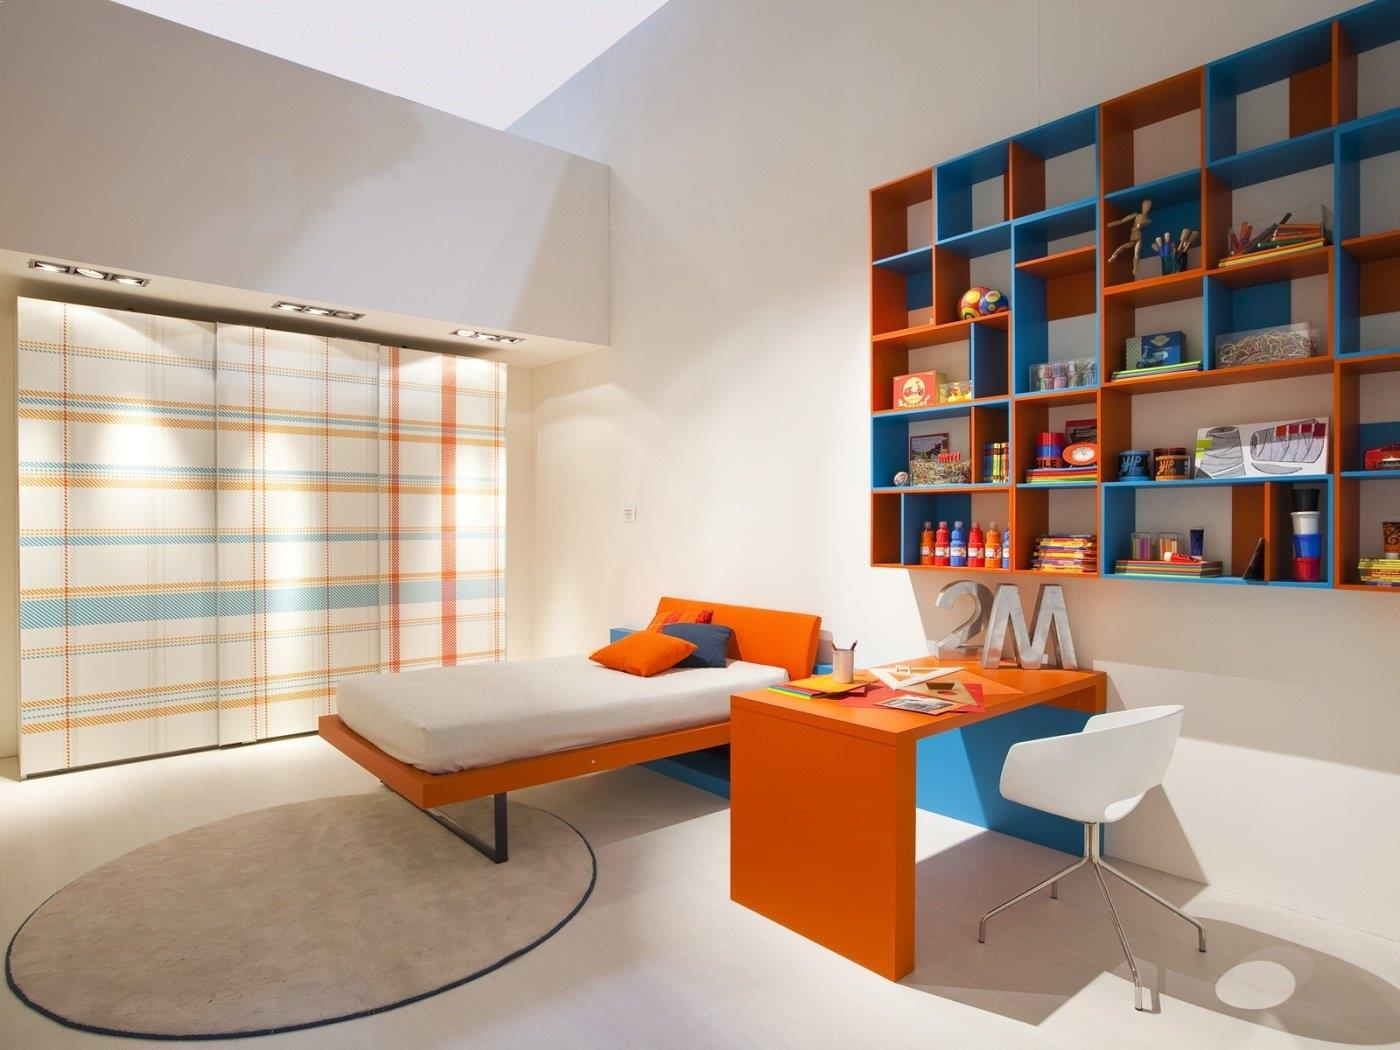 34-mibilier-inteligent-design-interior-smart